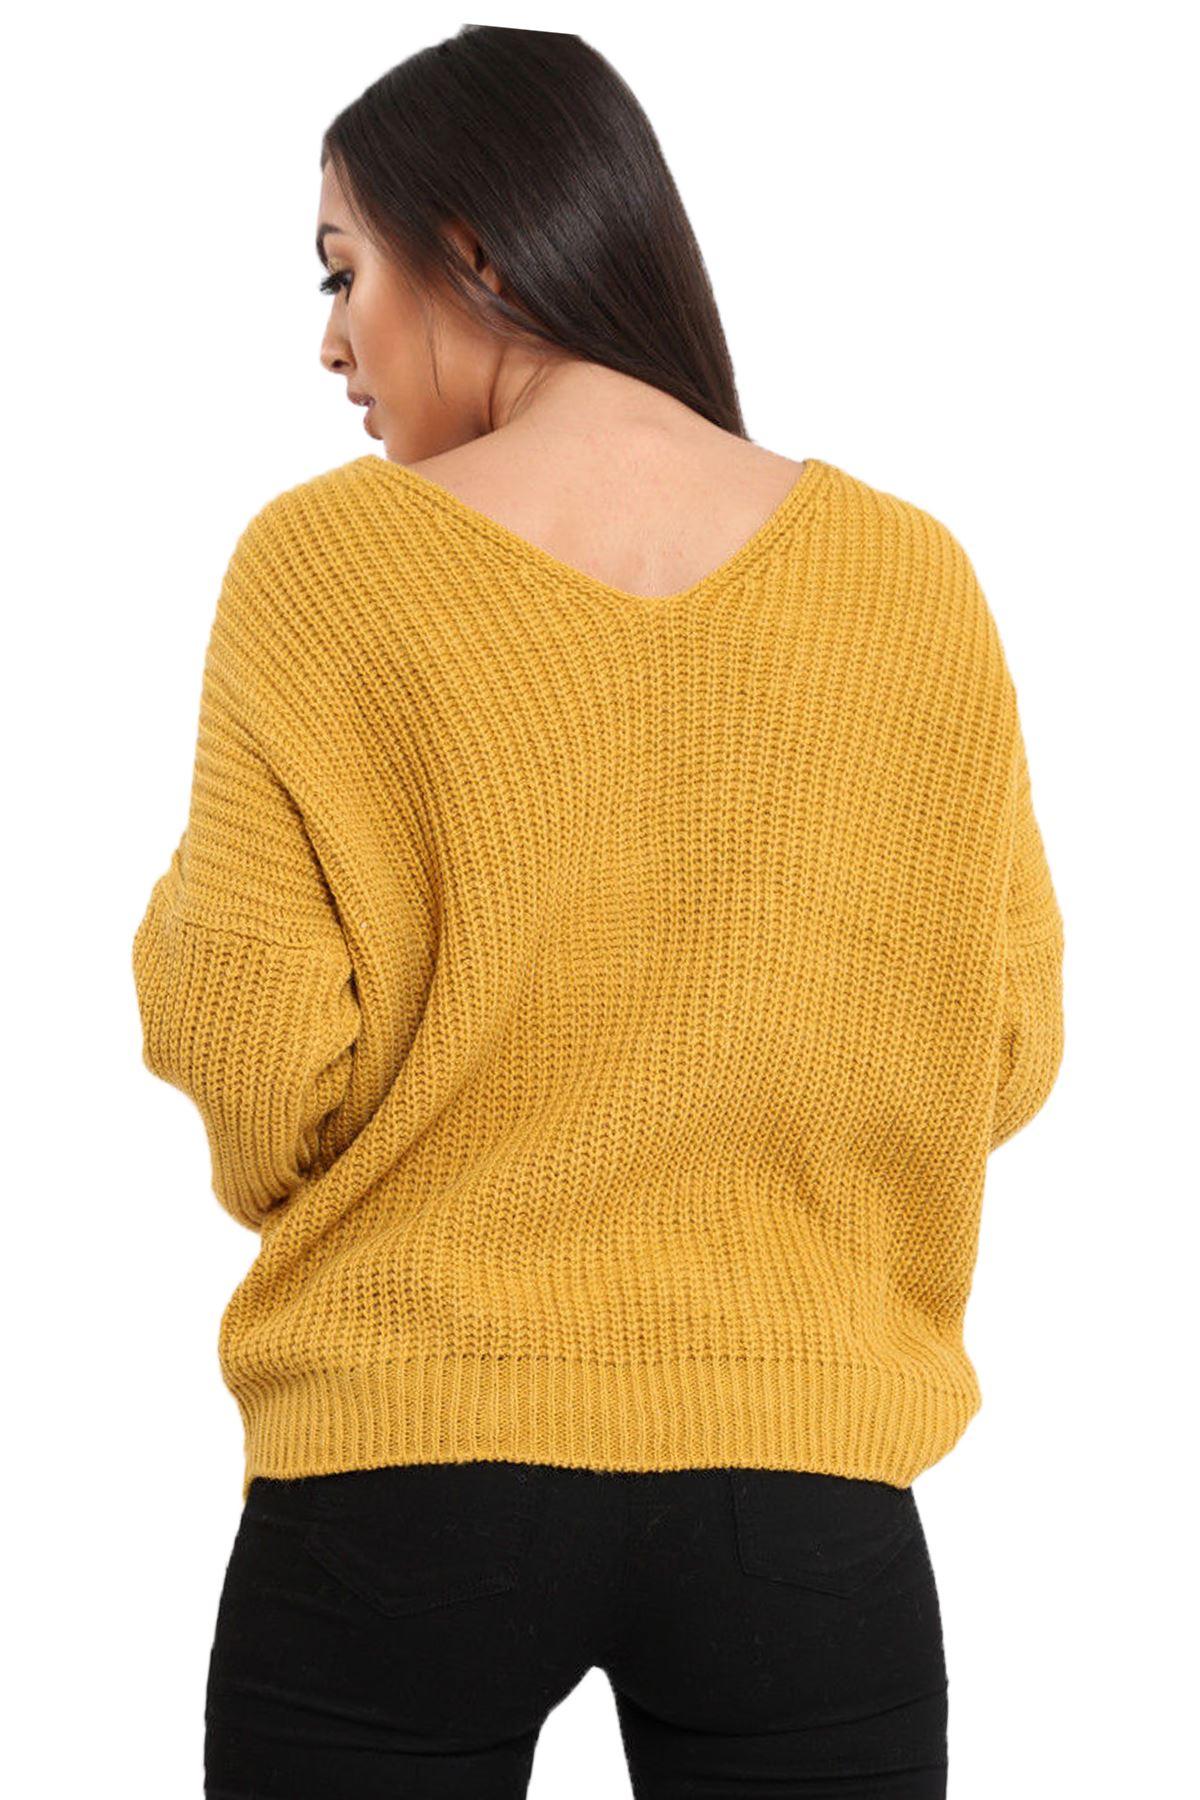 Ladies Twist Knot Wrap Reversible Baggy Italian Knitted Jumper Top Baggy